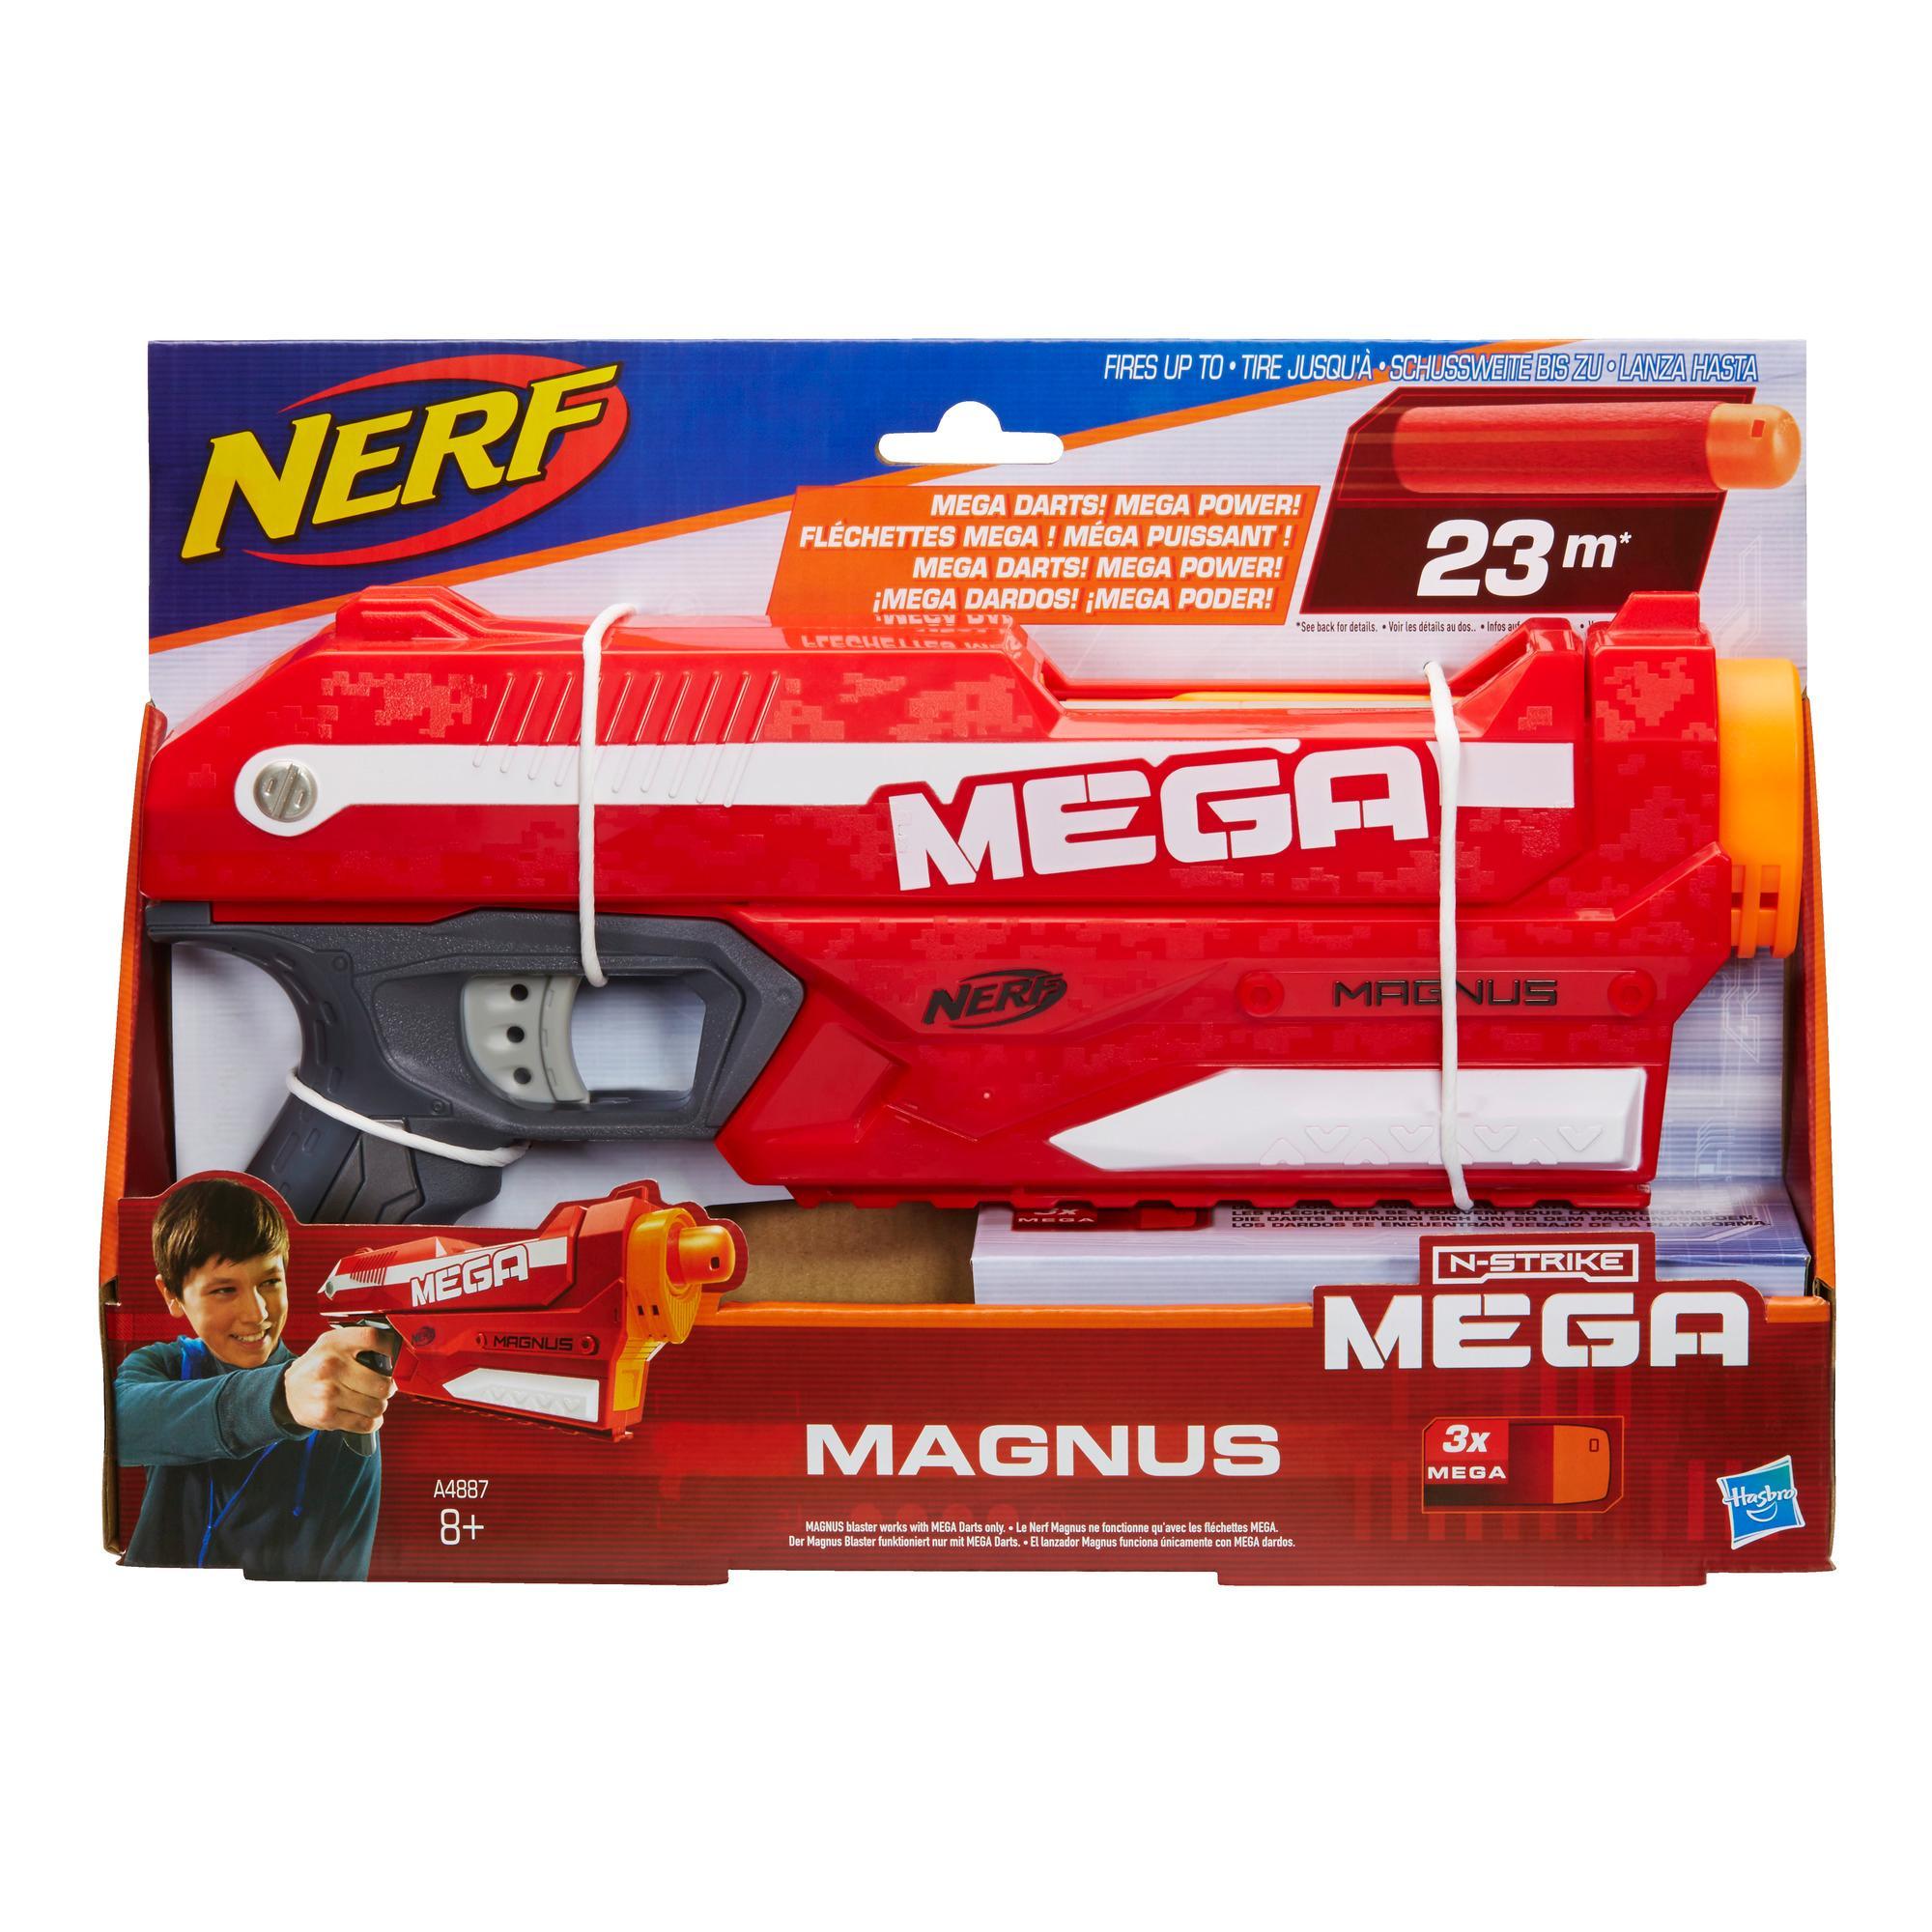 Blaster Magnus Nerf Mega